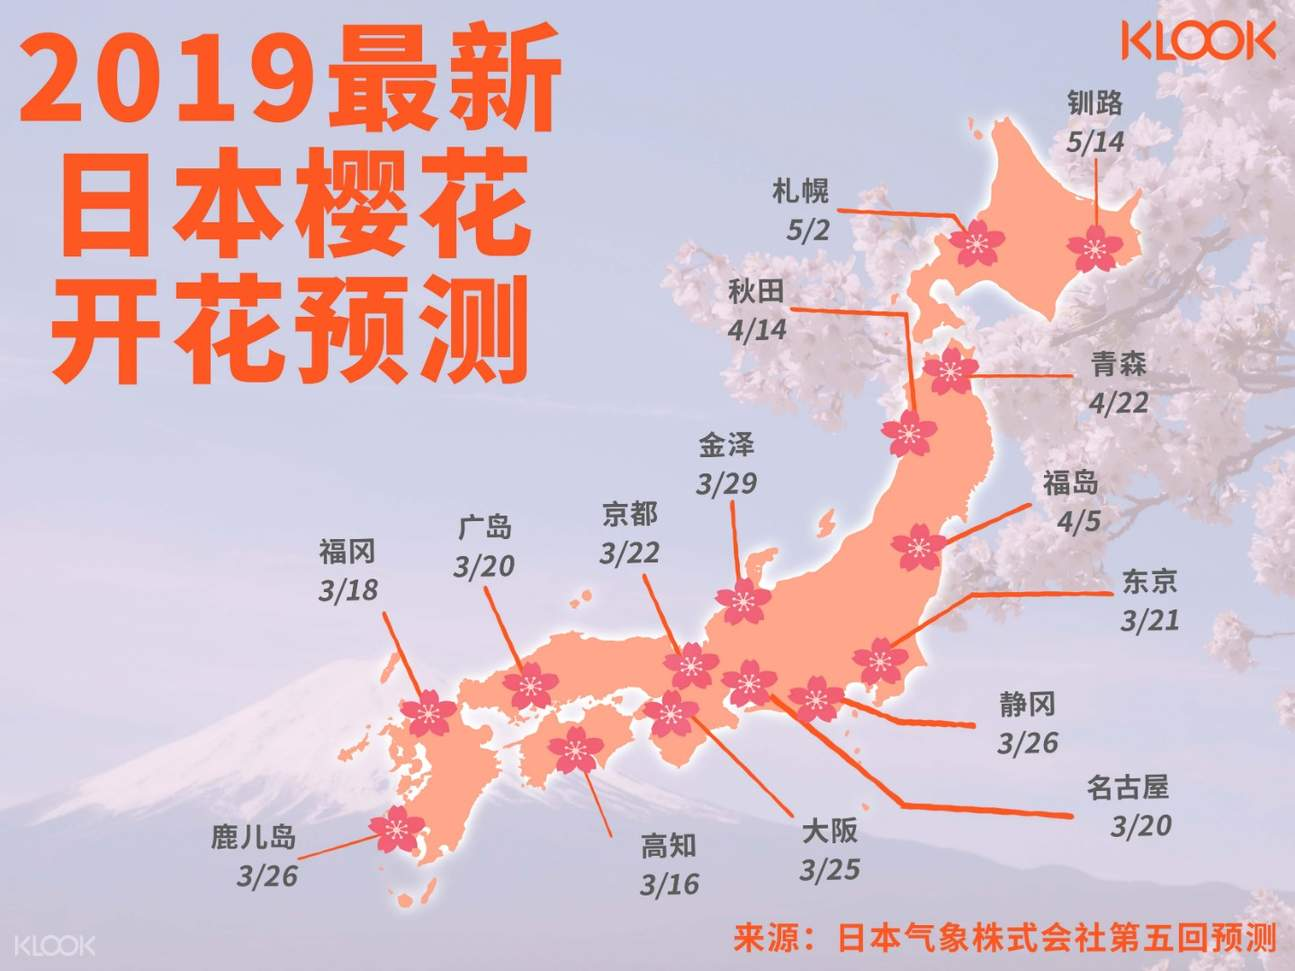 JR东日本-南北海道铁路周游券